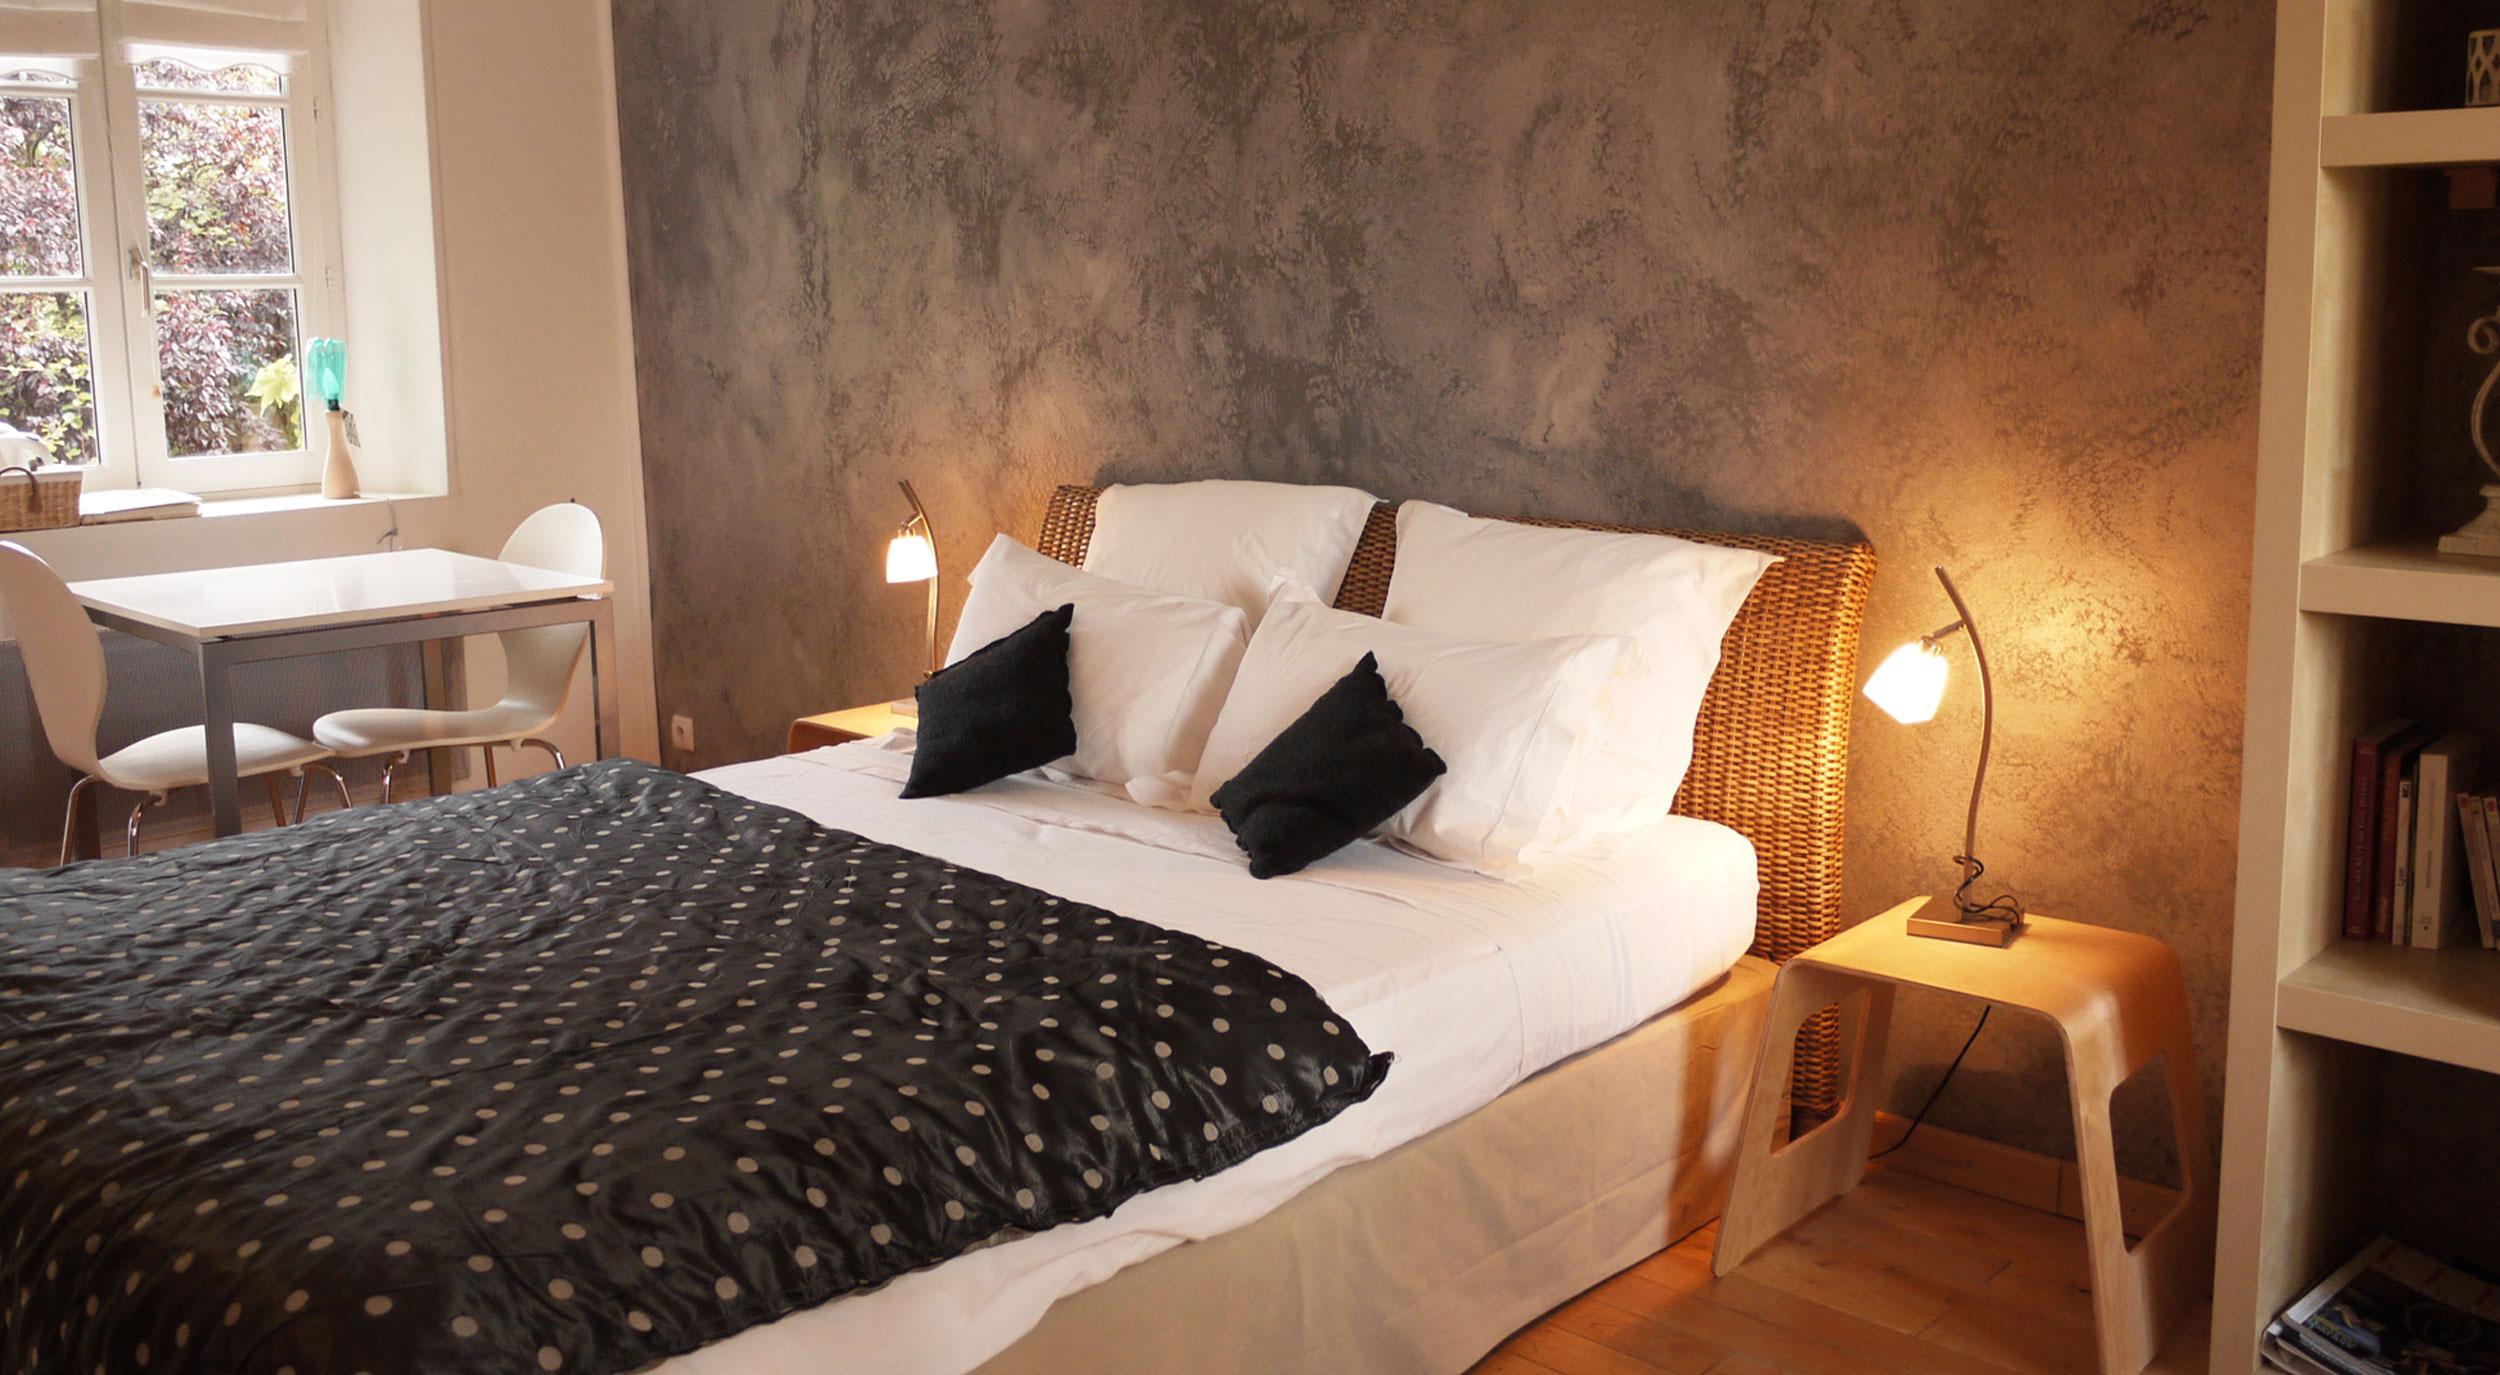 impressionnant chambre d hote lyon centre. Black Bedroom Furniture Sets. Home Design Ideas